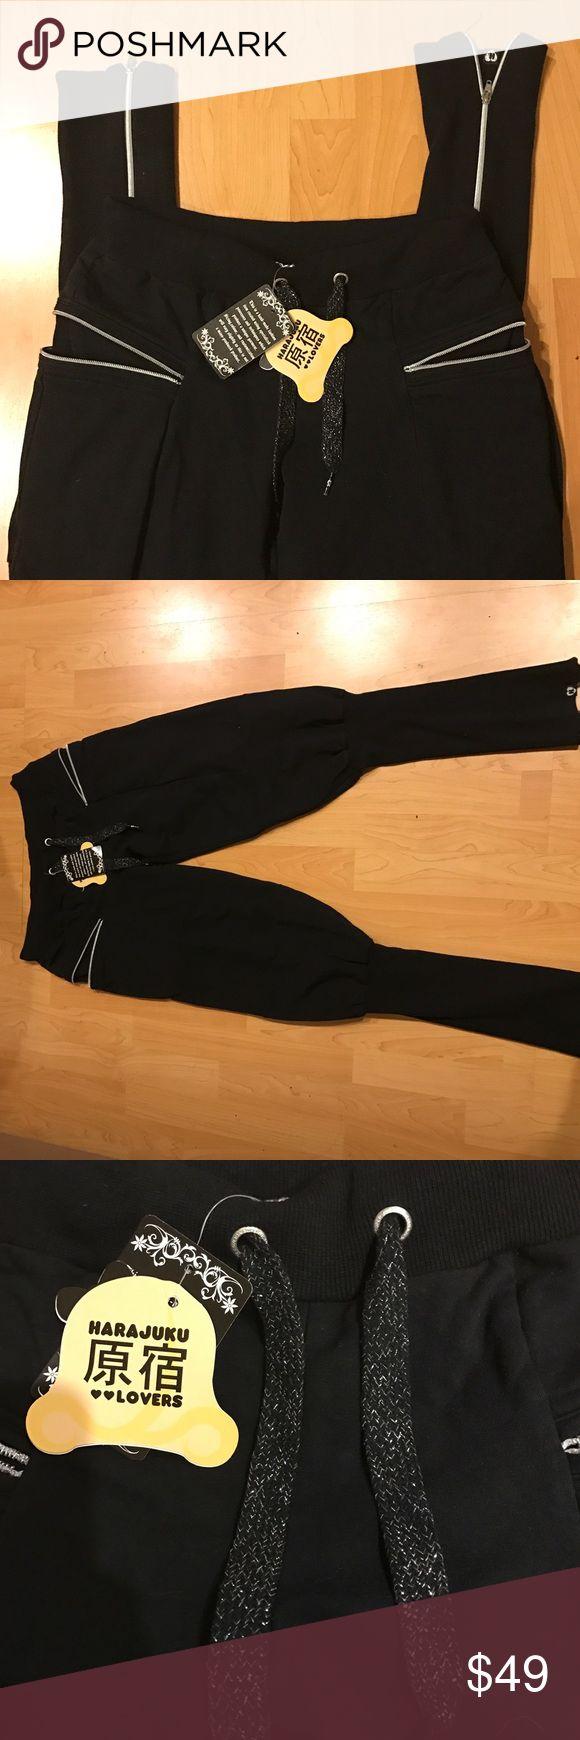 Harajuku Lovers love maniac sweat pants NWT Brand new with tags harajuku love maniac zippered skinny sweat pants. Harajuku Lovers Pants